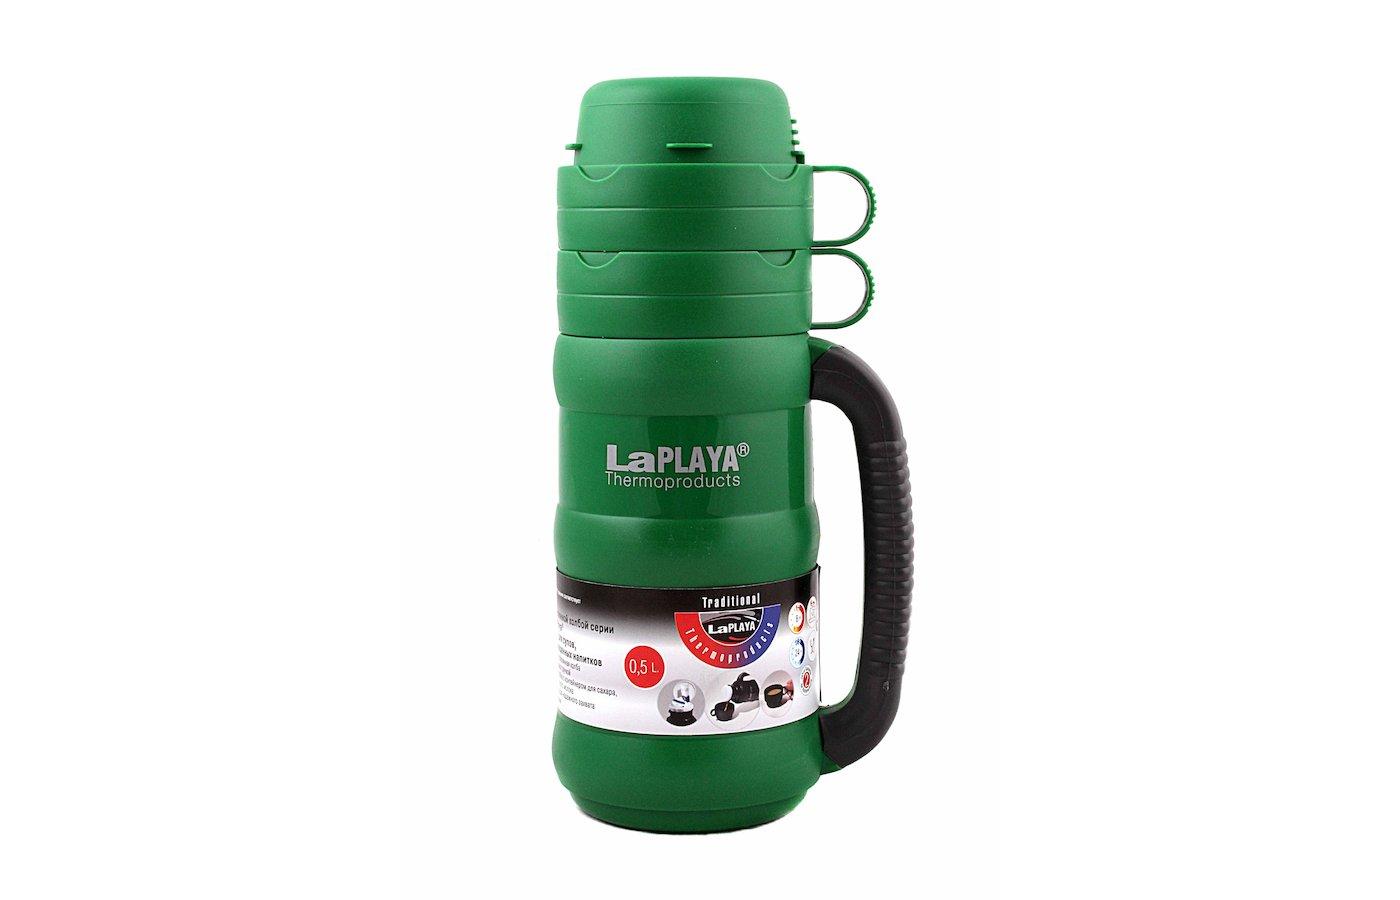 Термос LaPlaya 560004 Термос Traditional 35-50 light-green